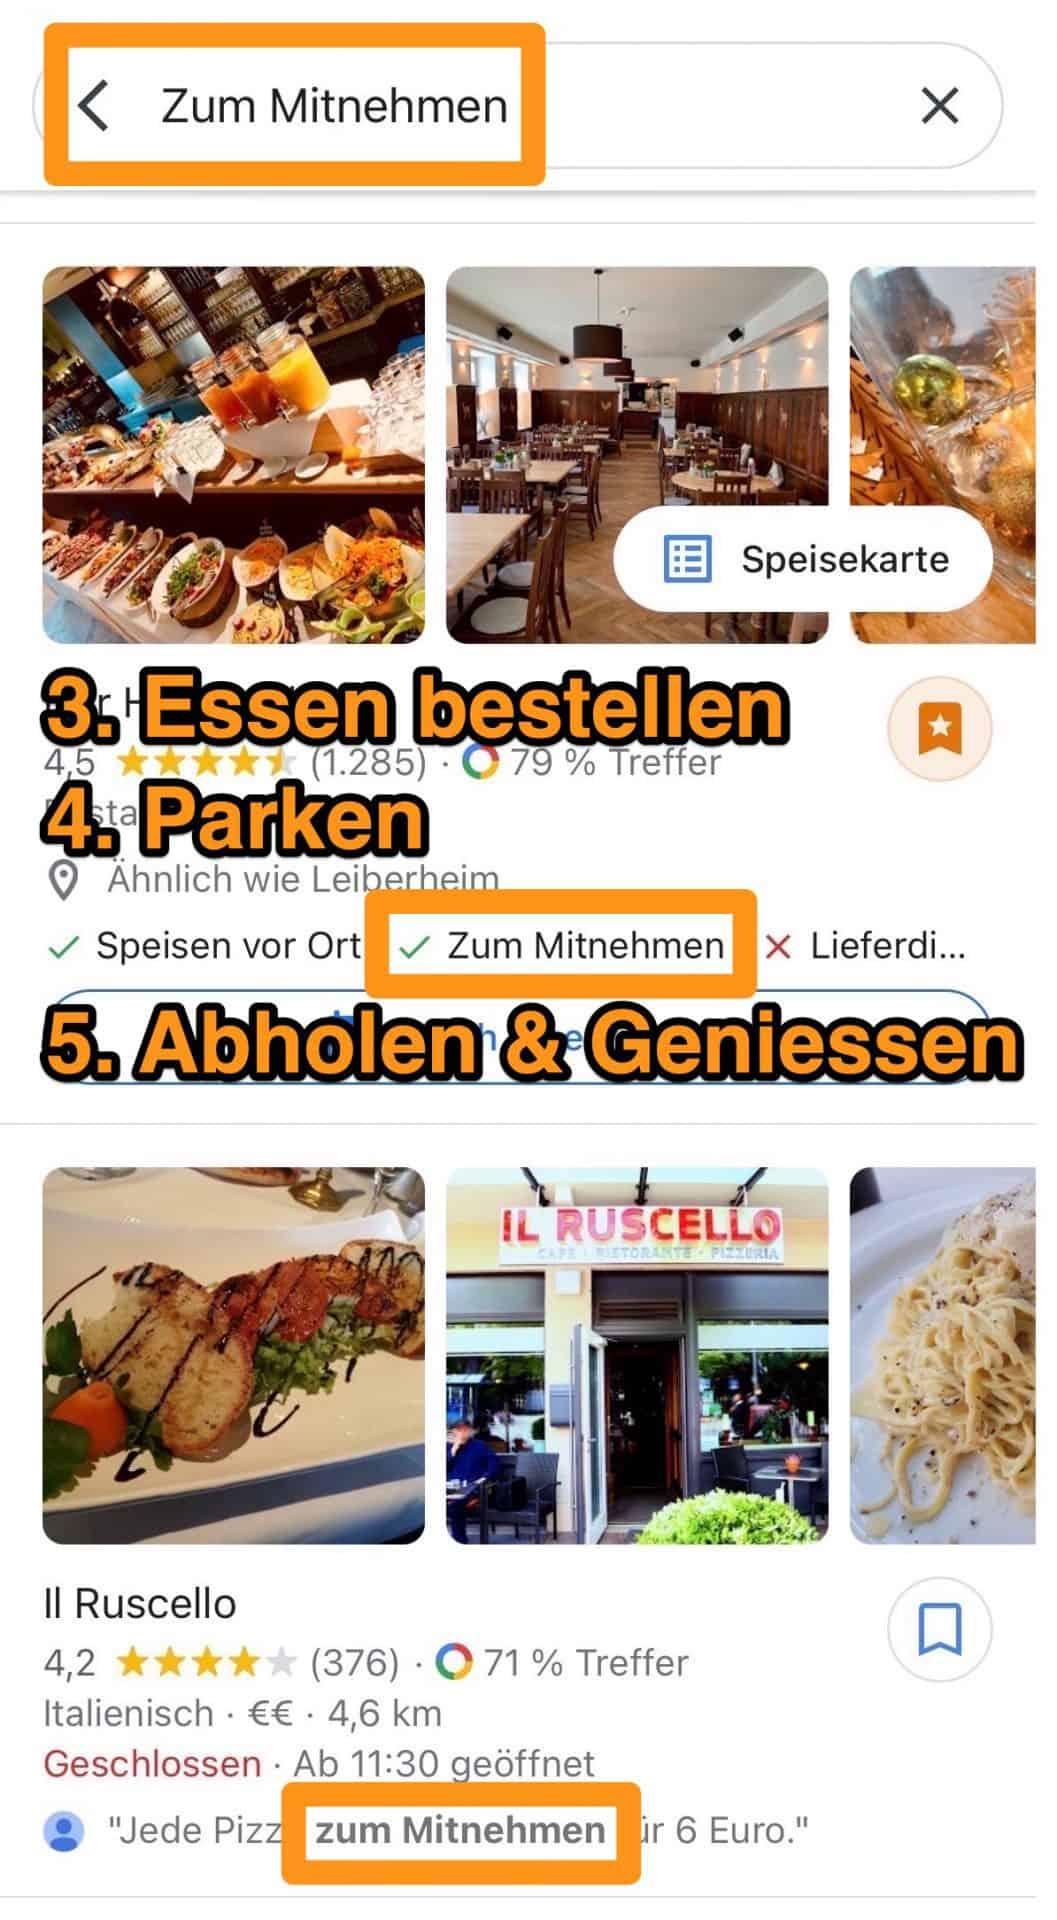 Wohnmobil-Dinner-Google-Maps-Mobile-App-Take-Away-zum-Mitnehmen